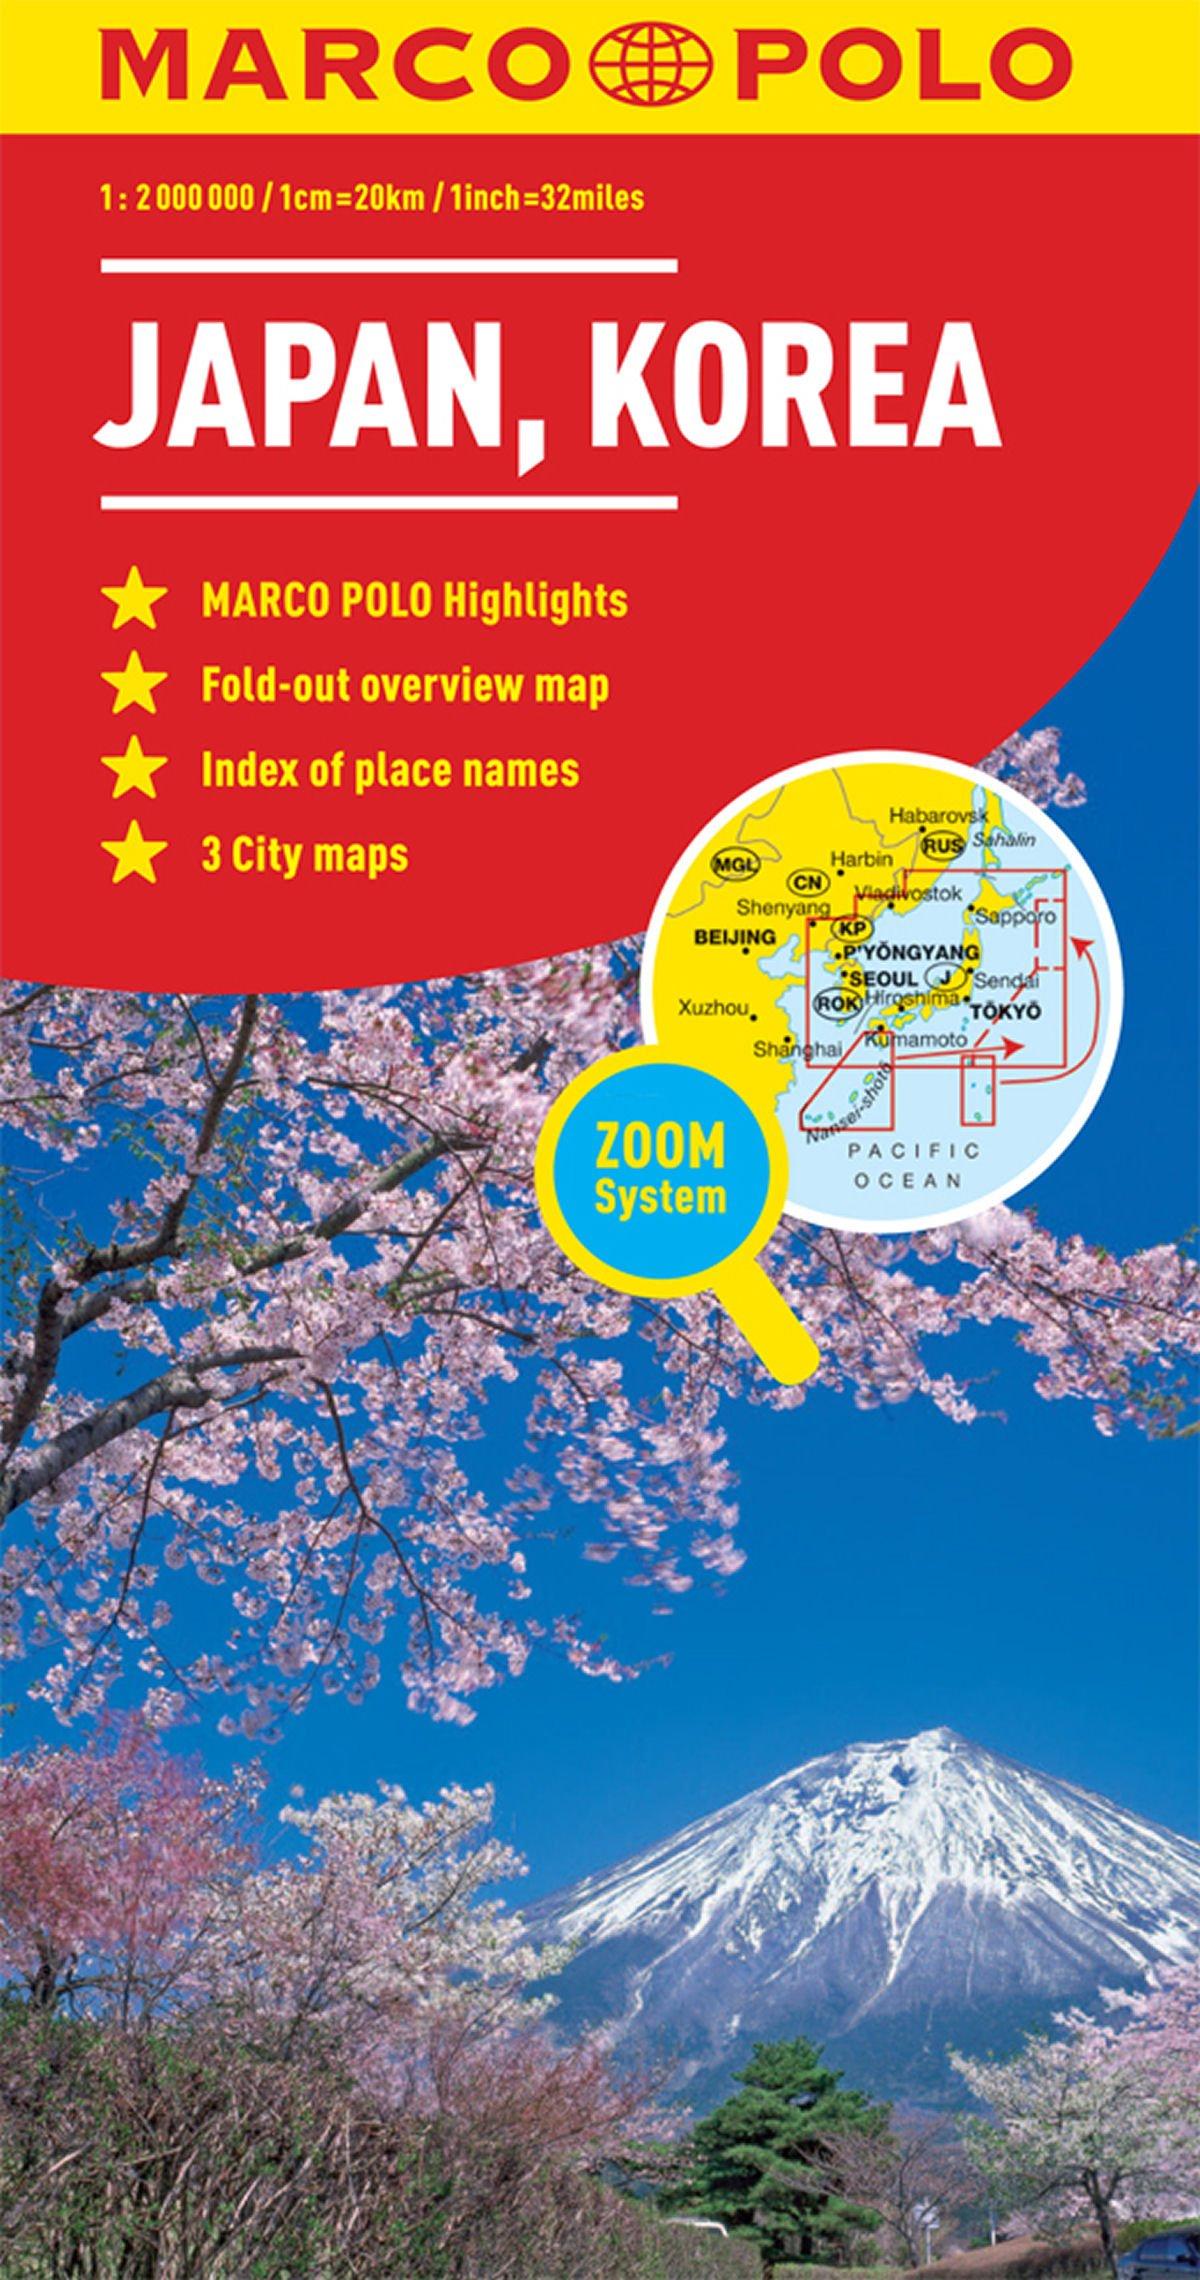 Japan Korea Marco Polo Map Marco Polo Maps Amazon Co Uk Marco